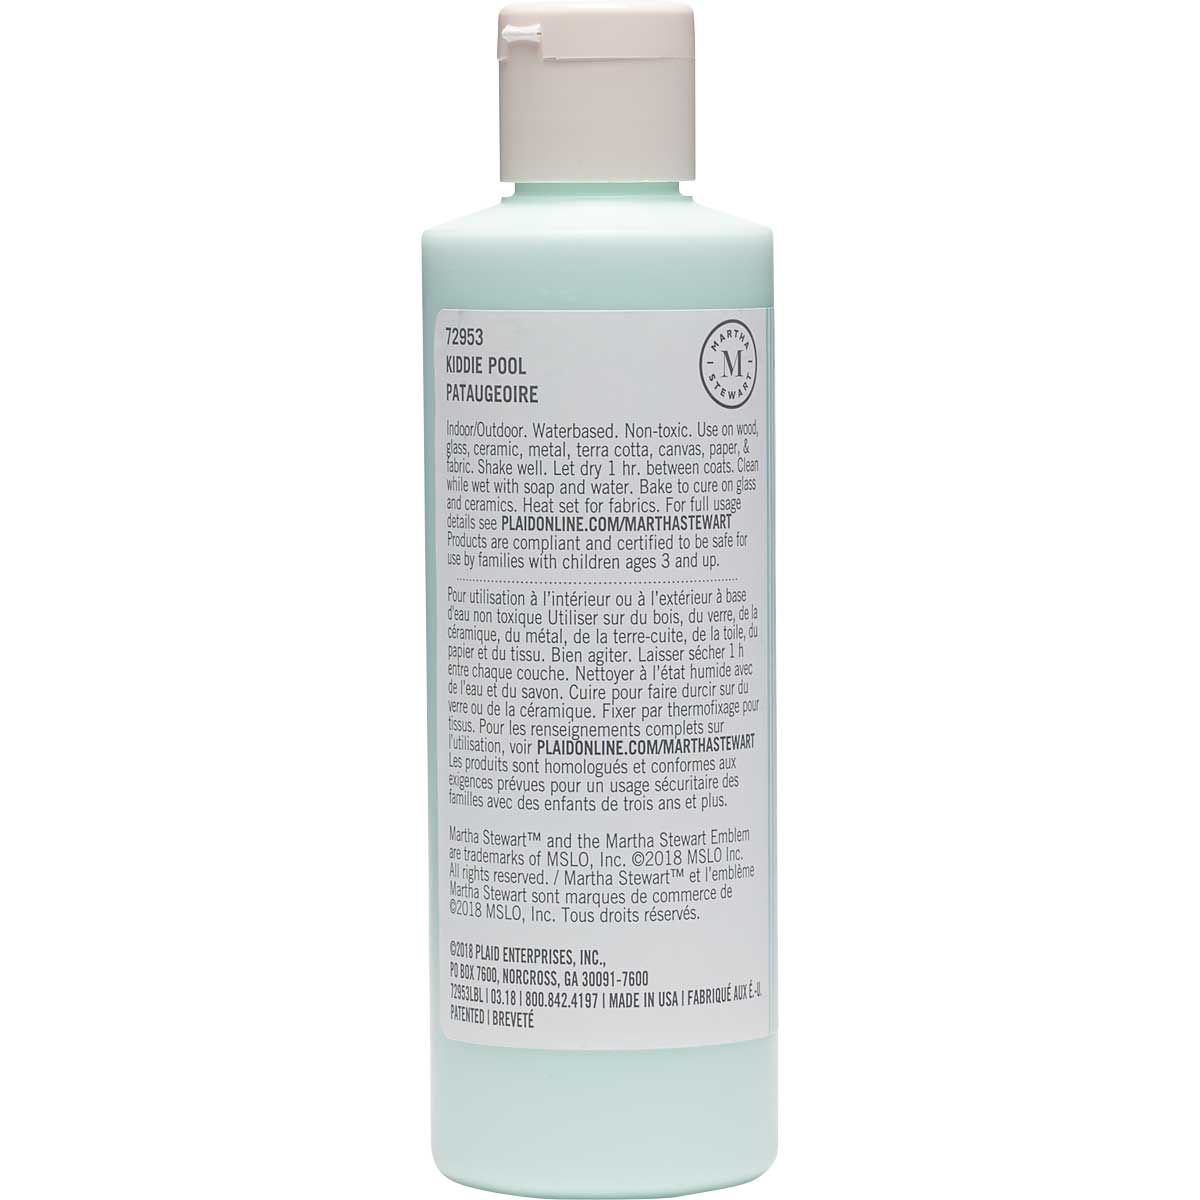 Martha Stewart ® Multi-Surface Satin Acrylic Craft Paint CPSIA - Kiddie Pool, 8 oz. - 72953